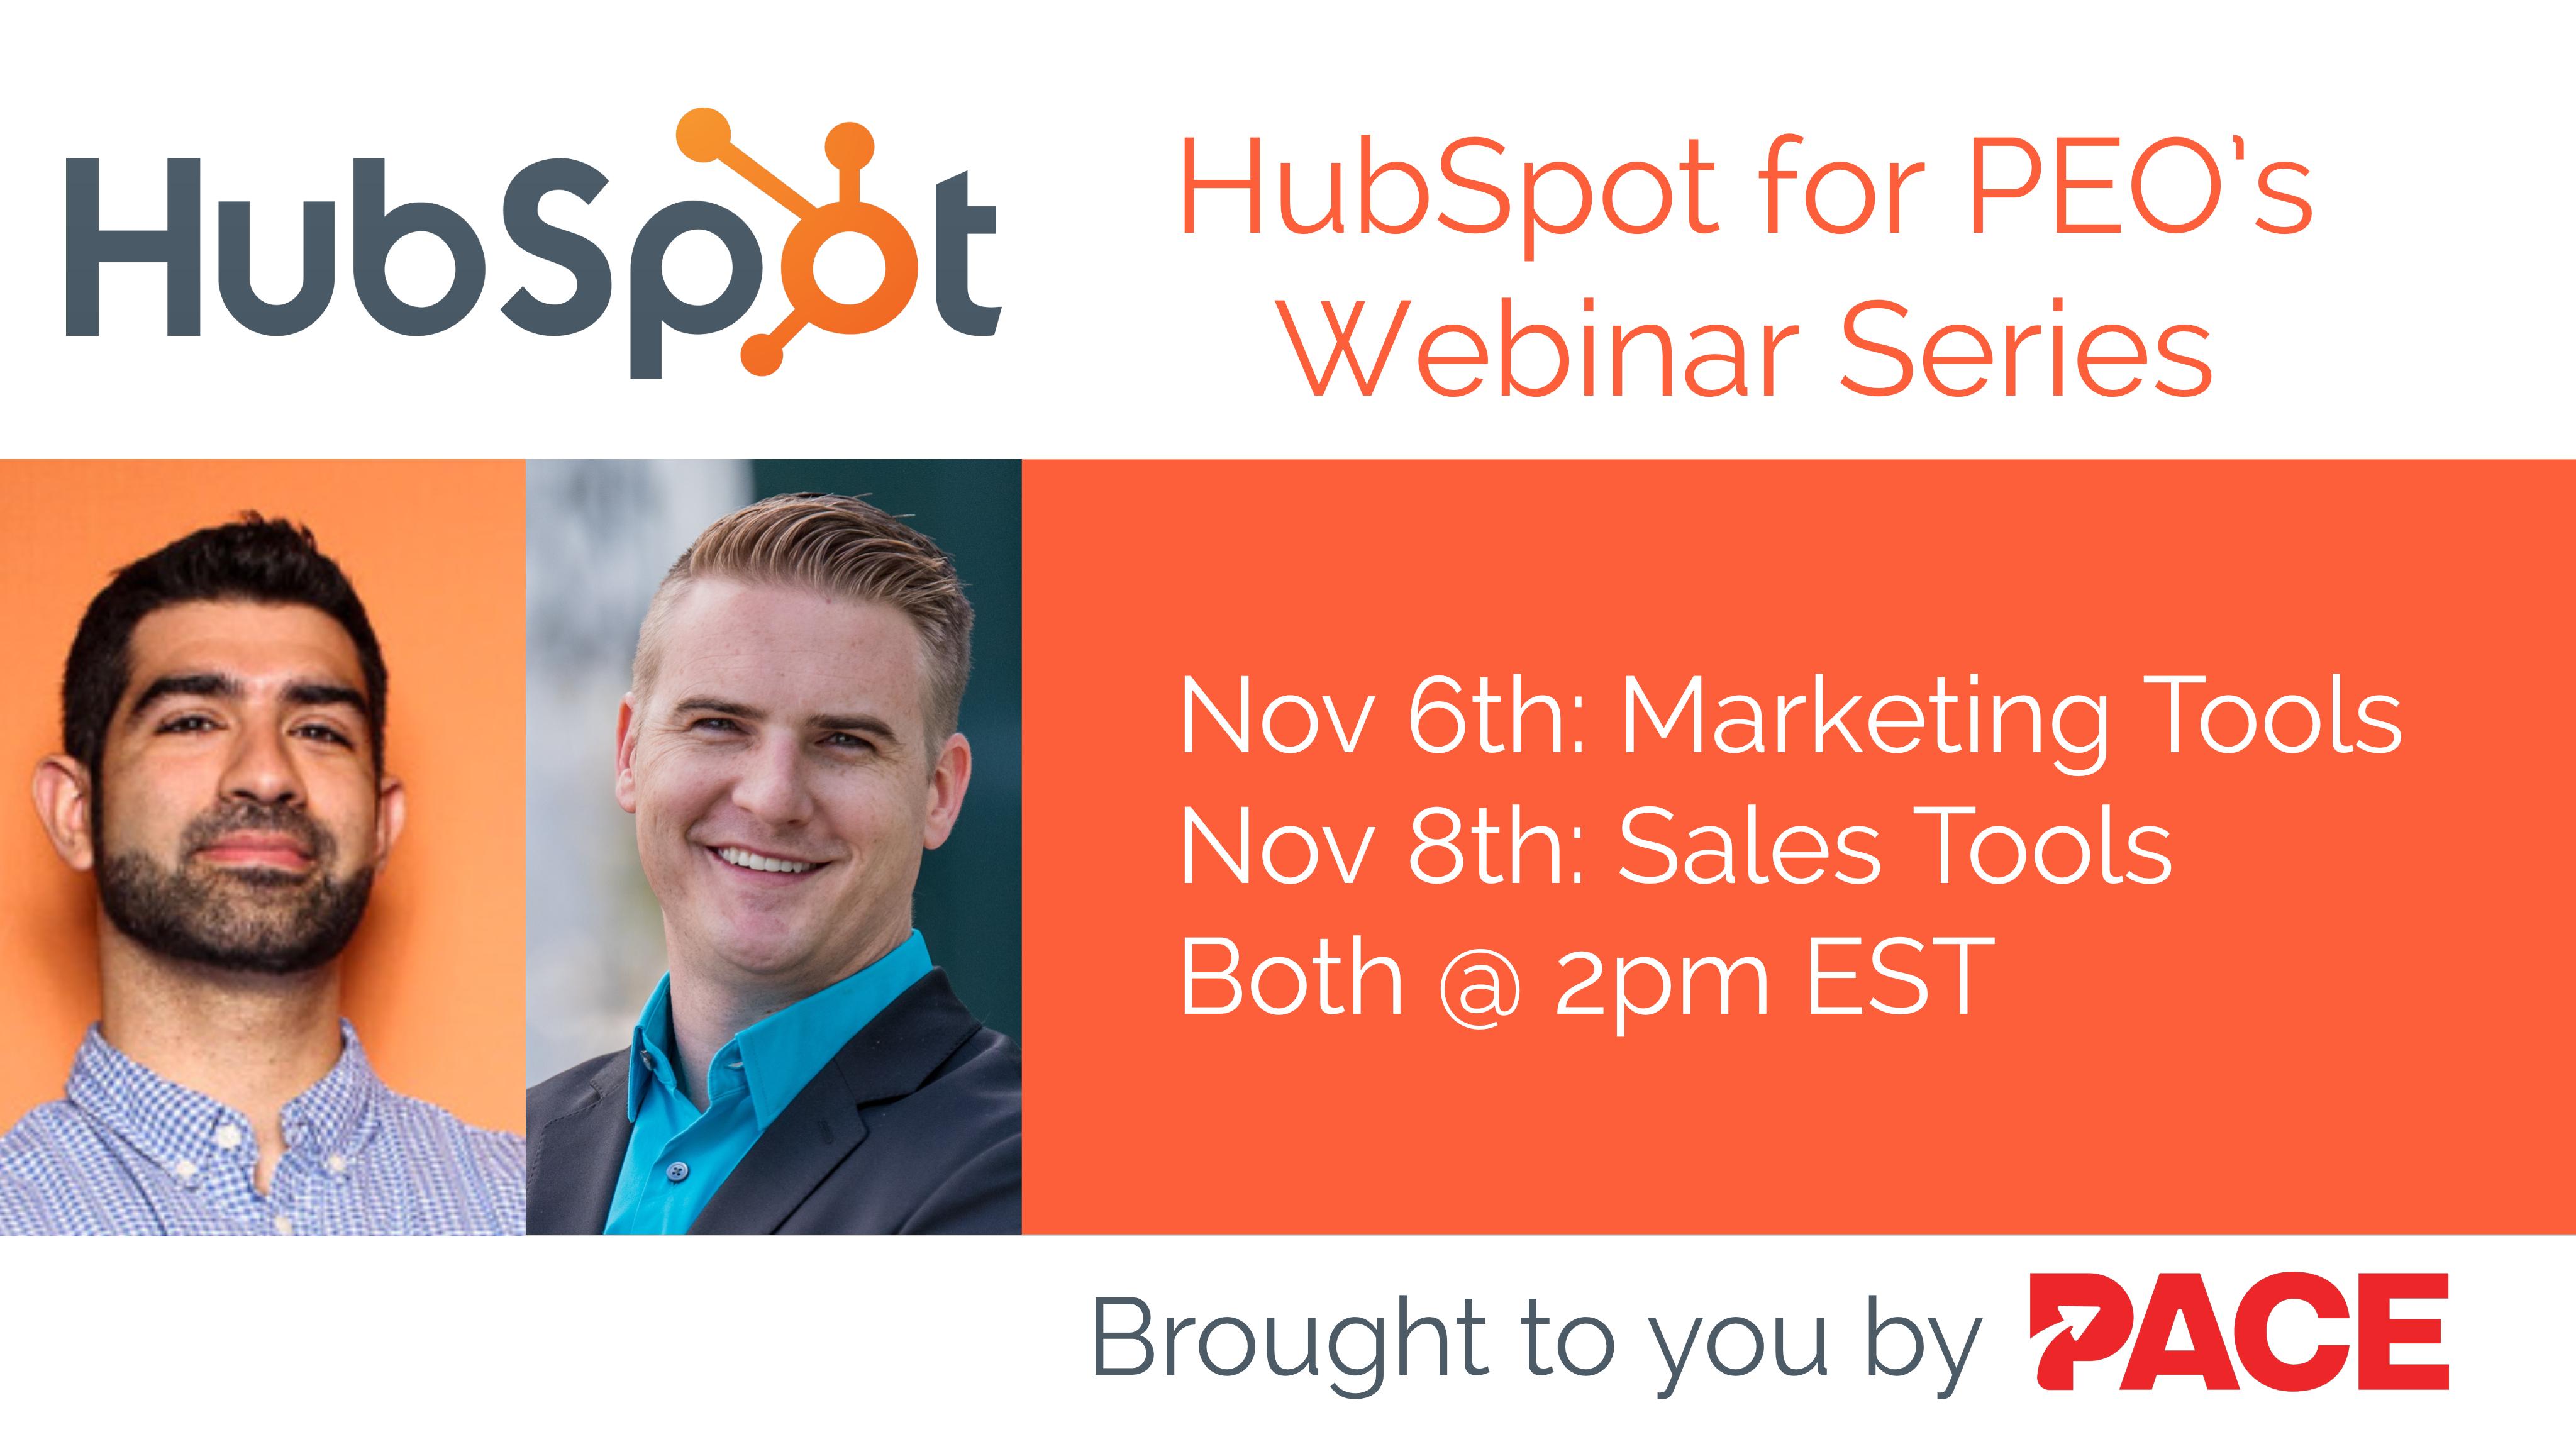 PACE HubSpot Sales & Marketing Webinar Series Blog Image